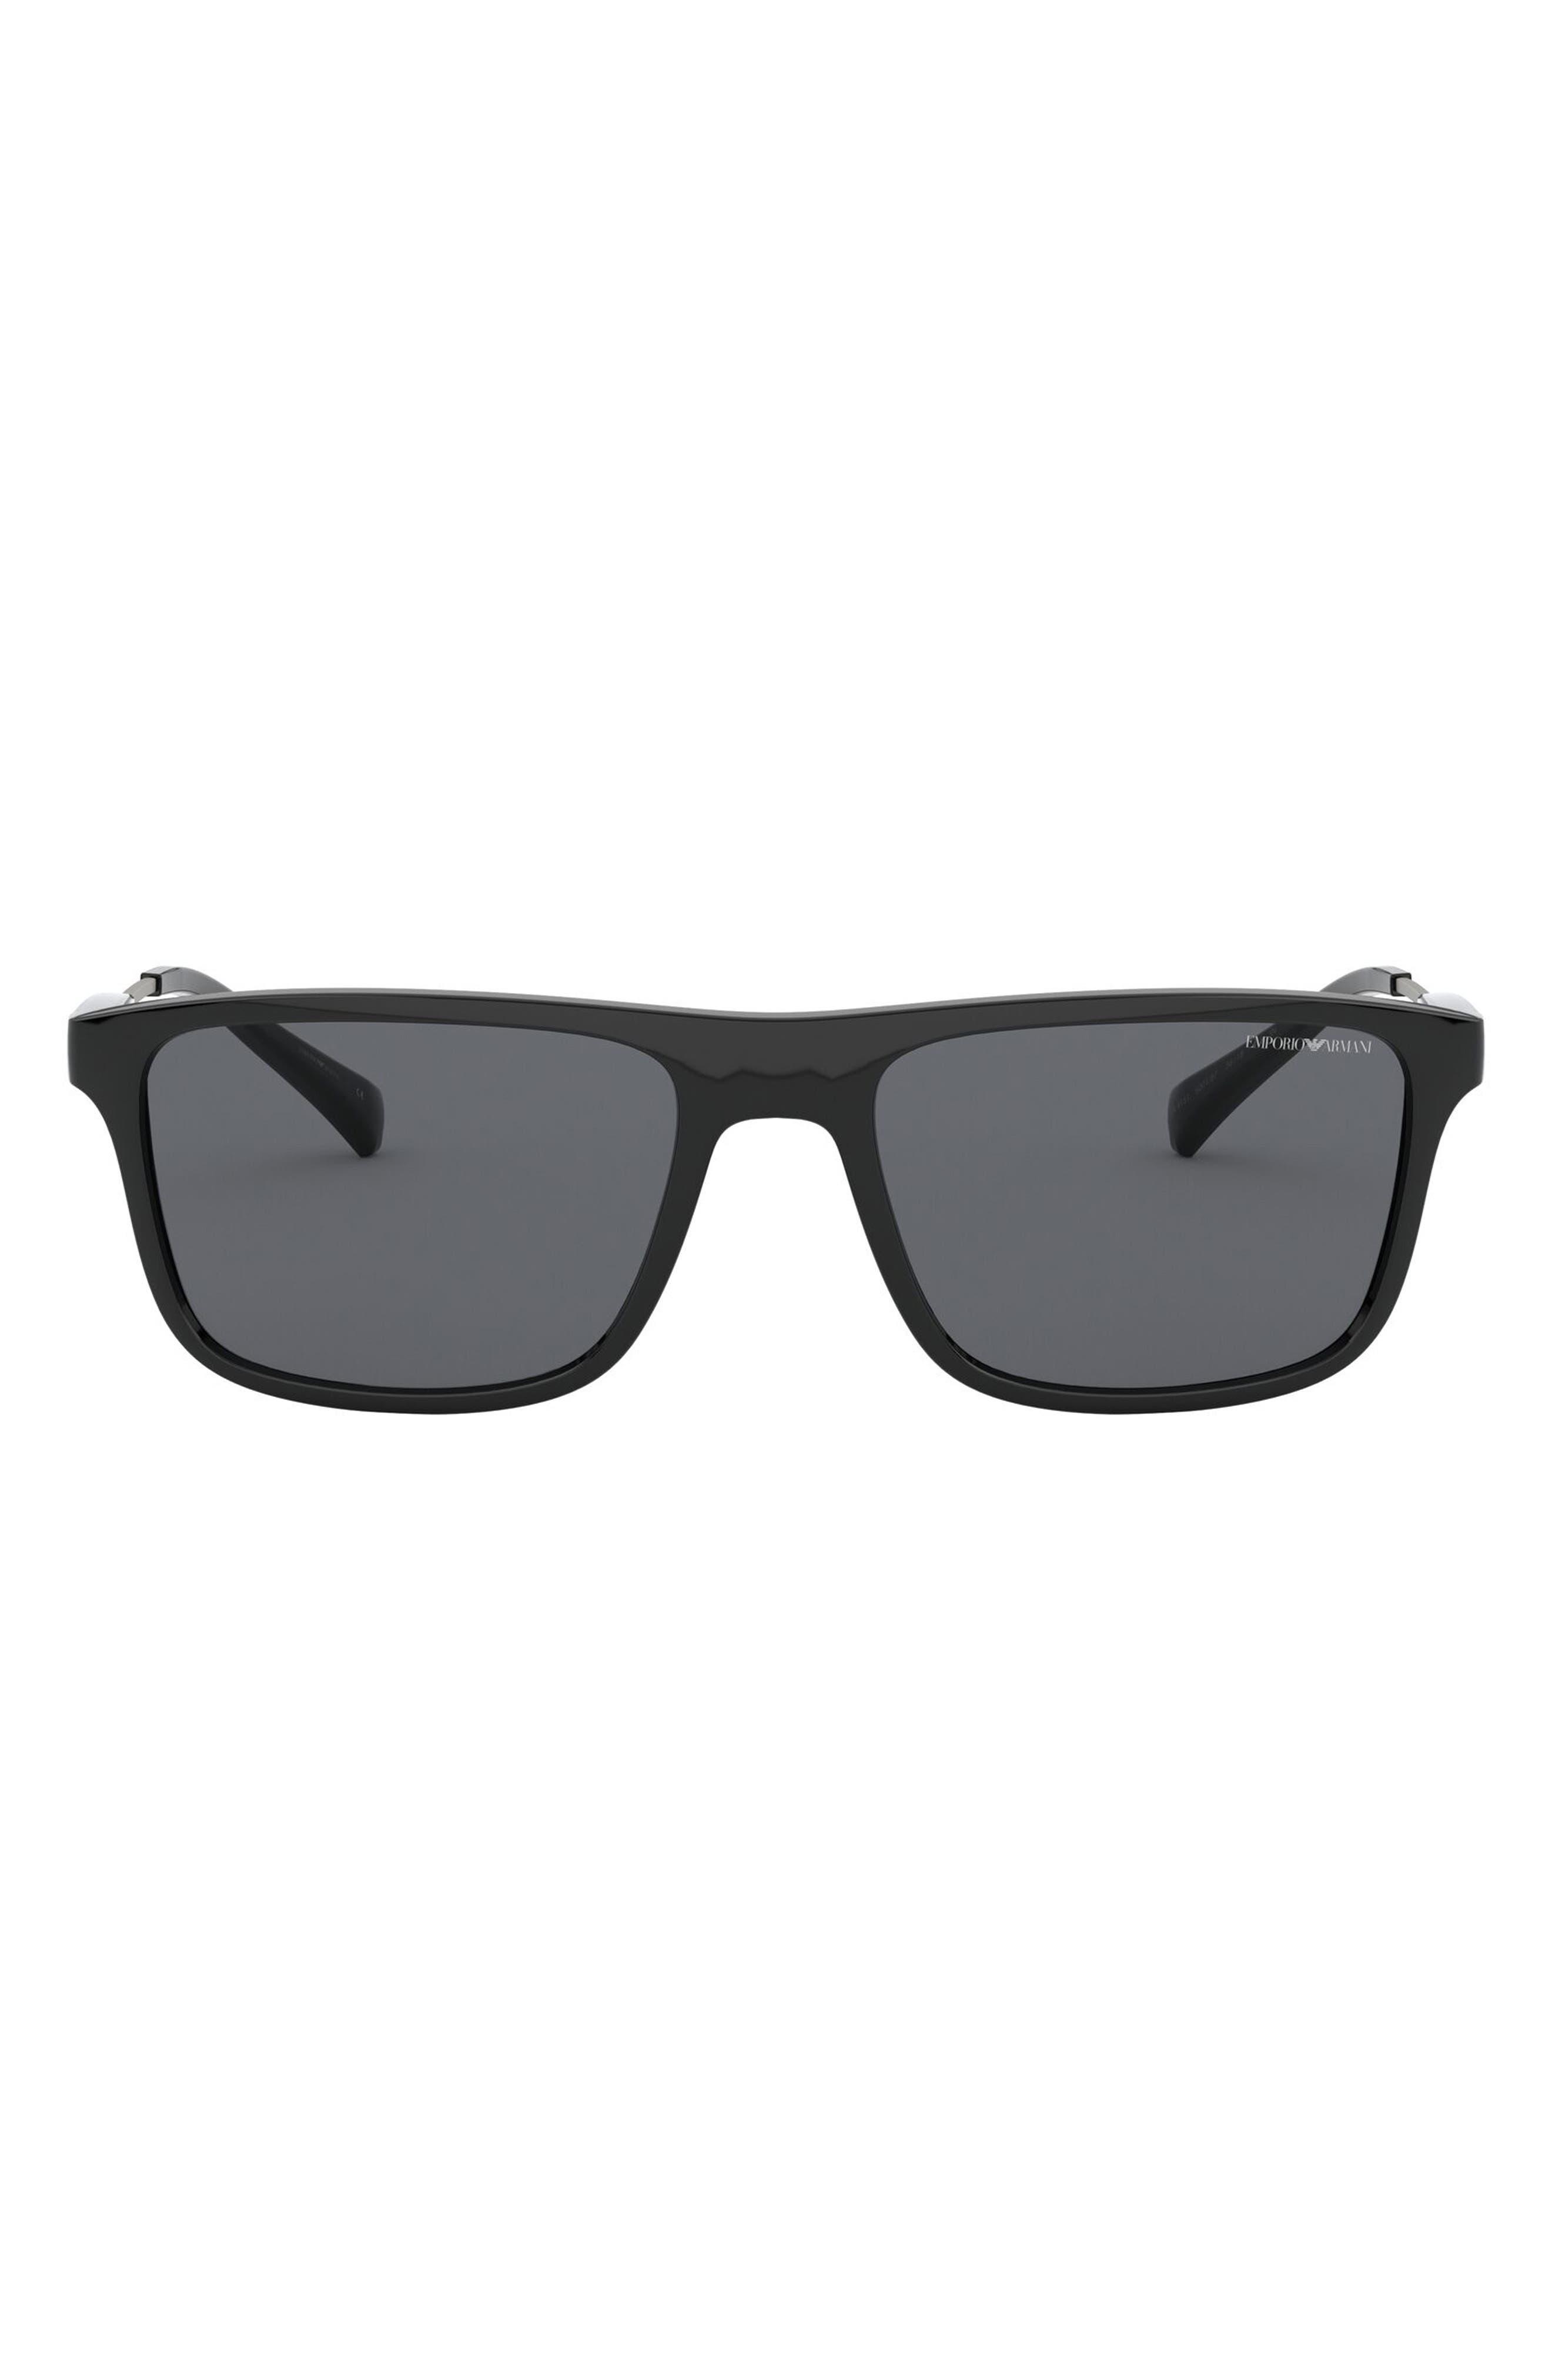 62mm Oversize Rectangular Sunglasses